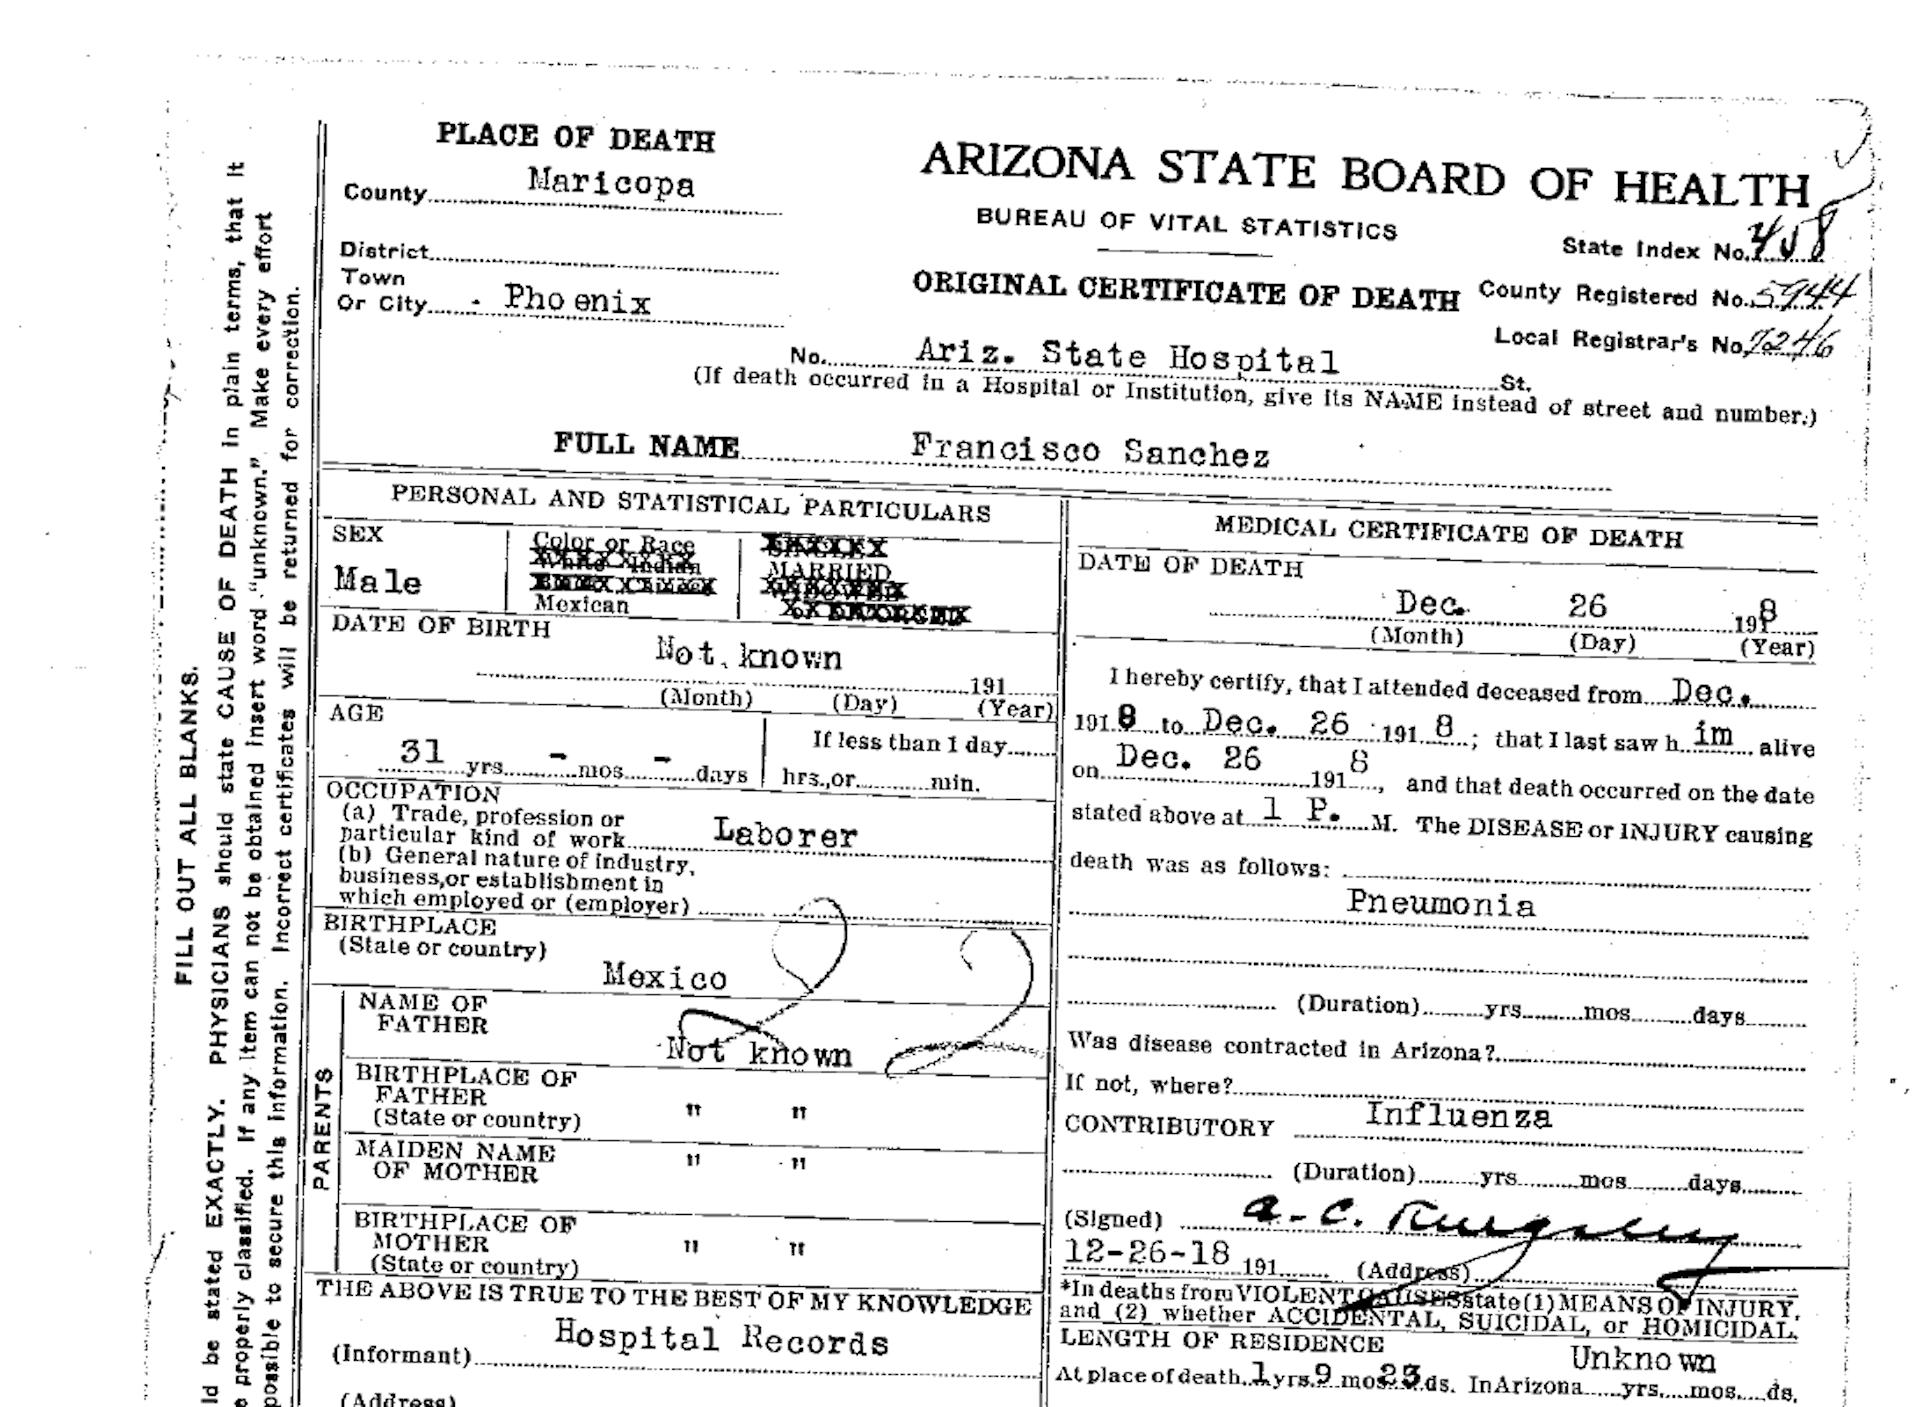 Obtaining a Certified Death Certificate in Arizona